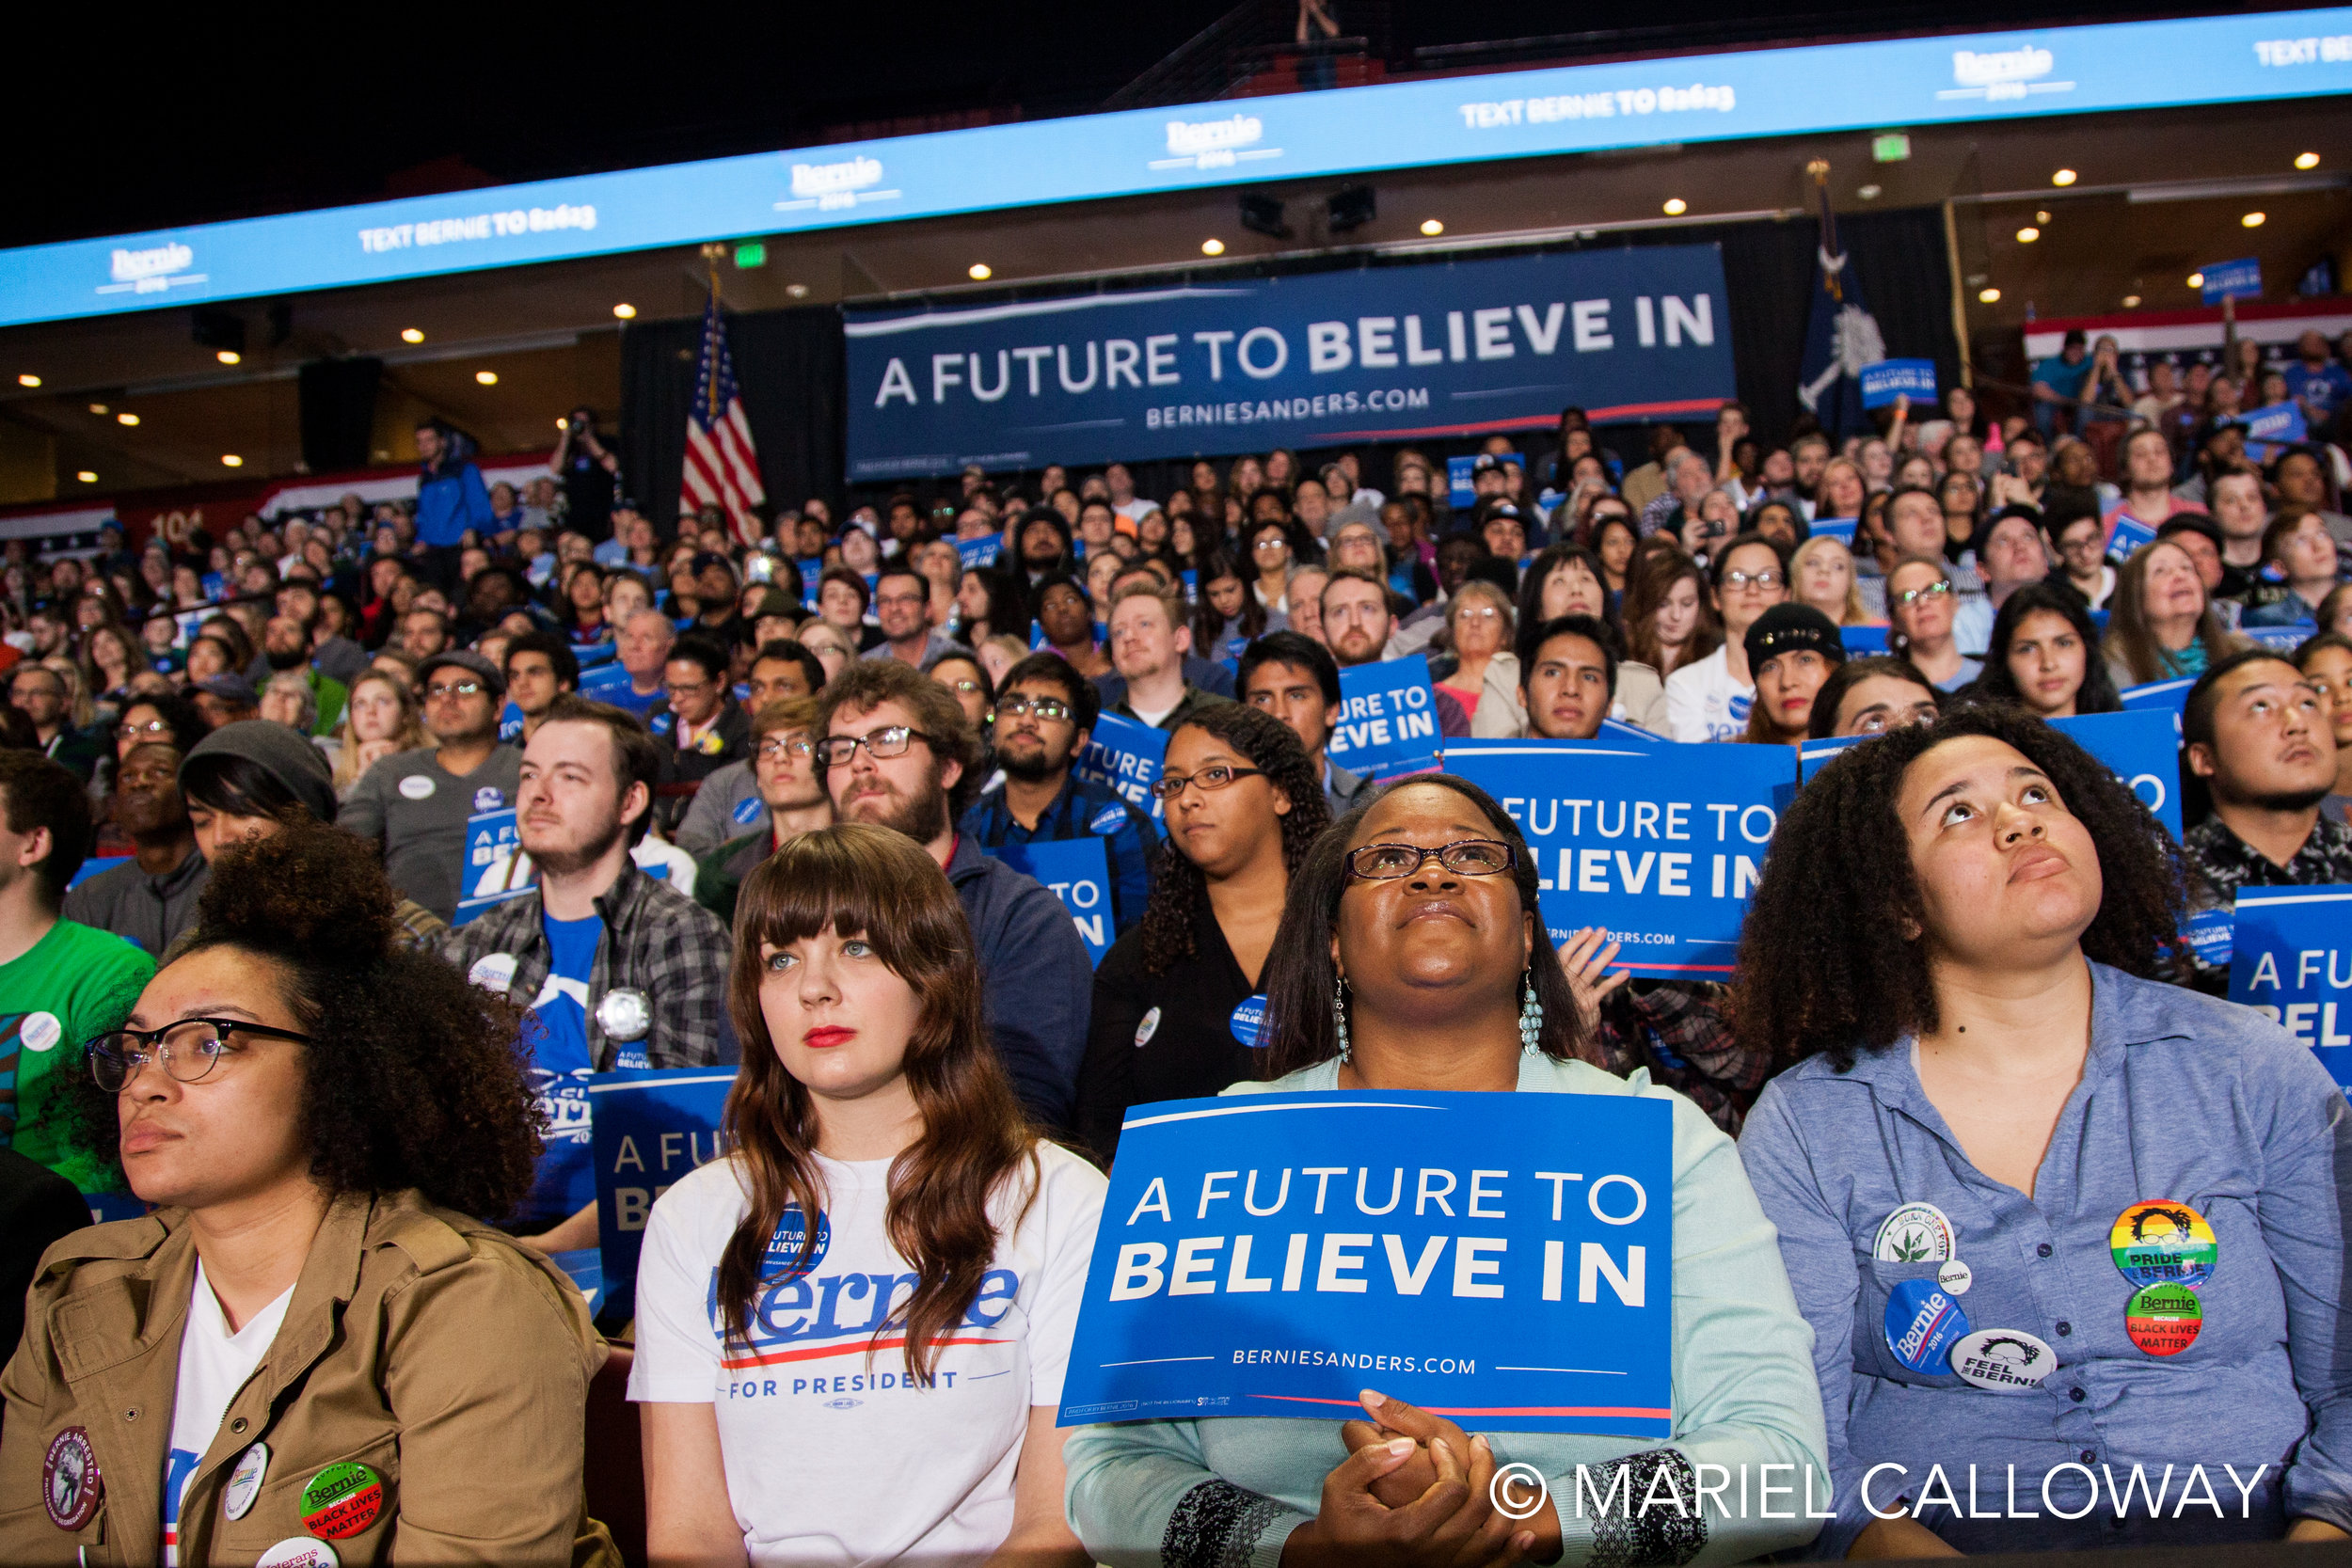 16_Bernie-Sanders-Greenville-South-Carolina-6.jpg